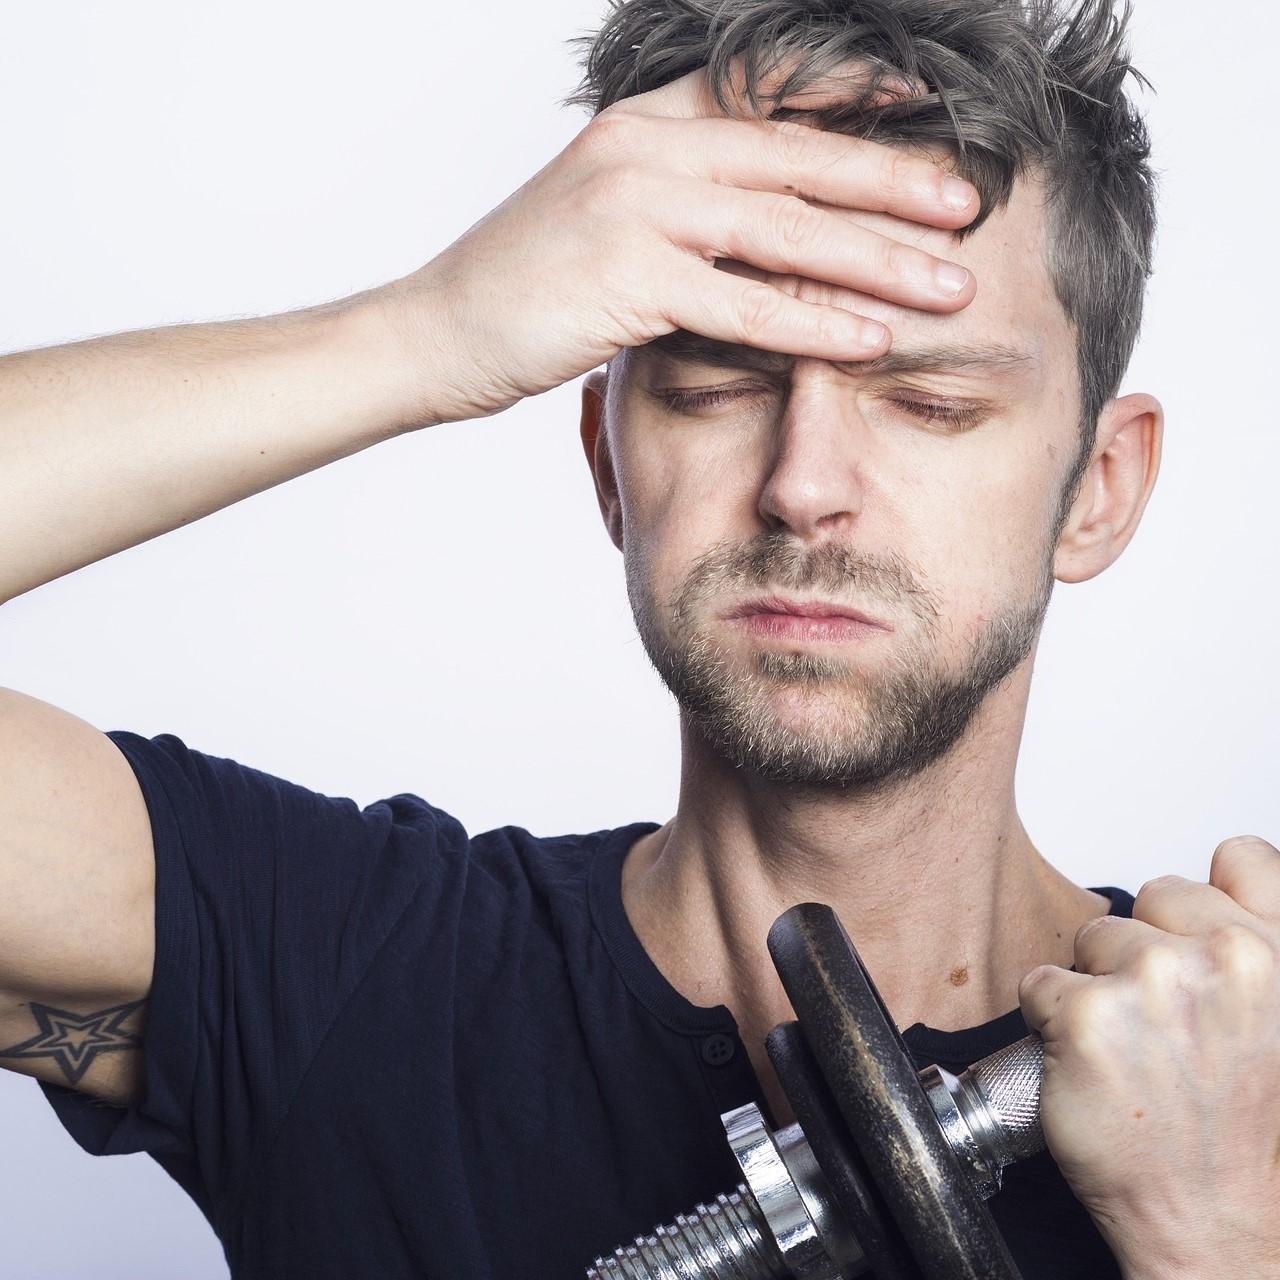 Übertraining – Der Sportler-Burnout